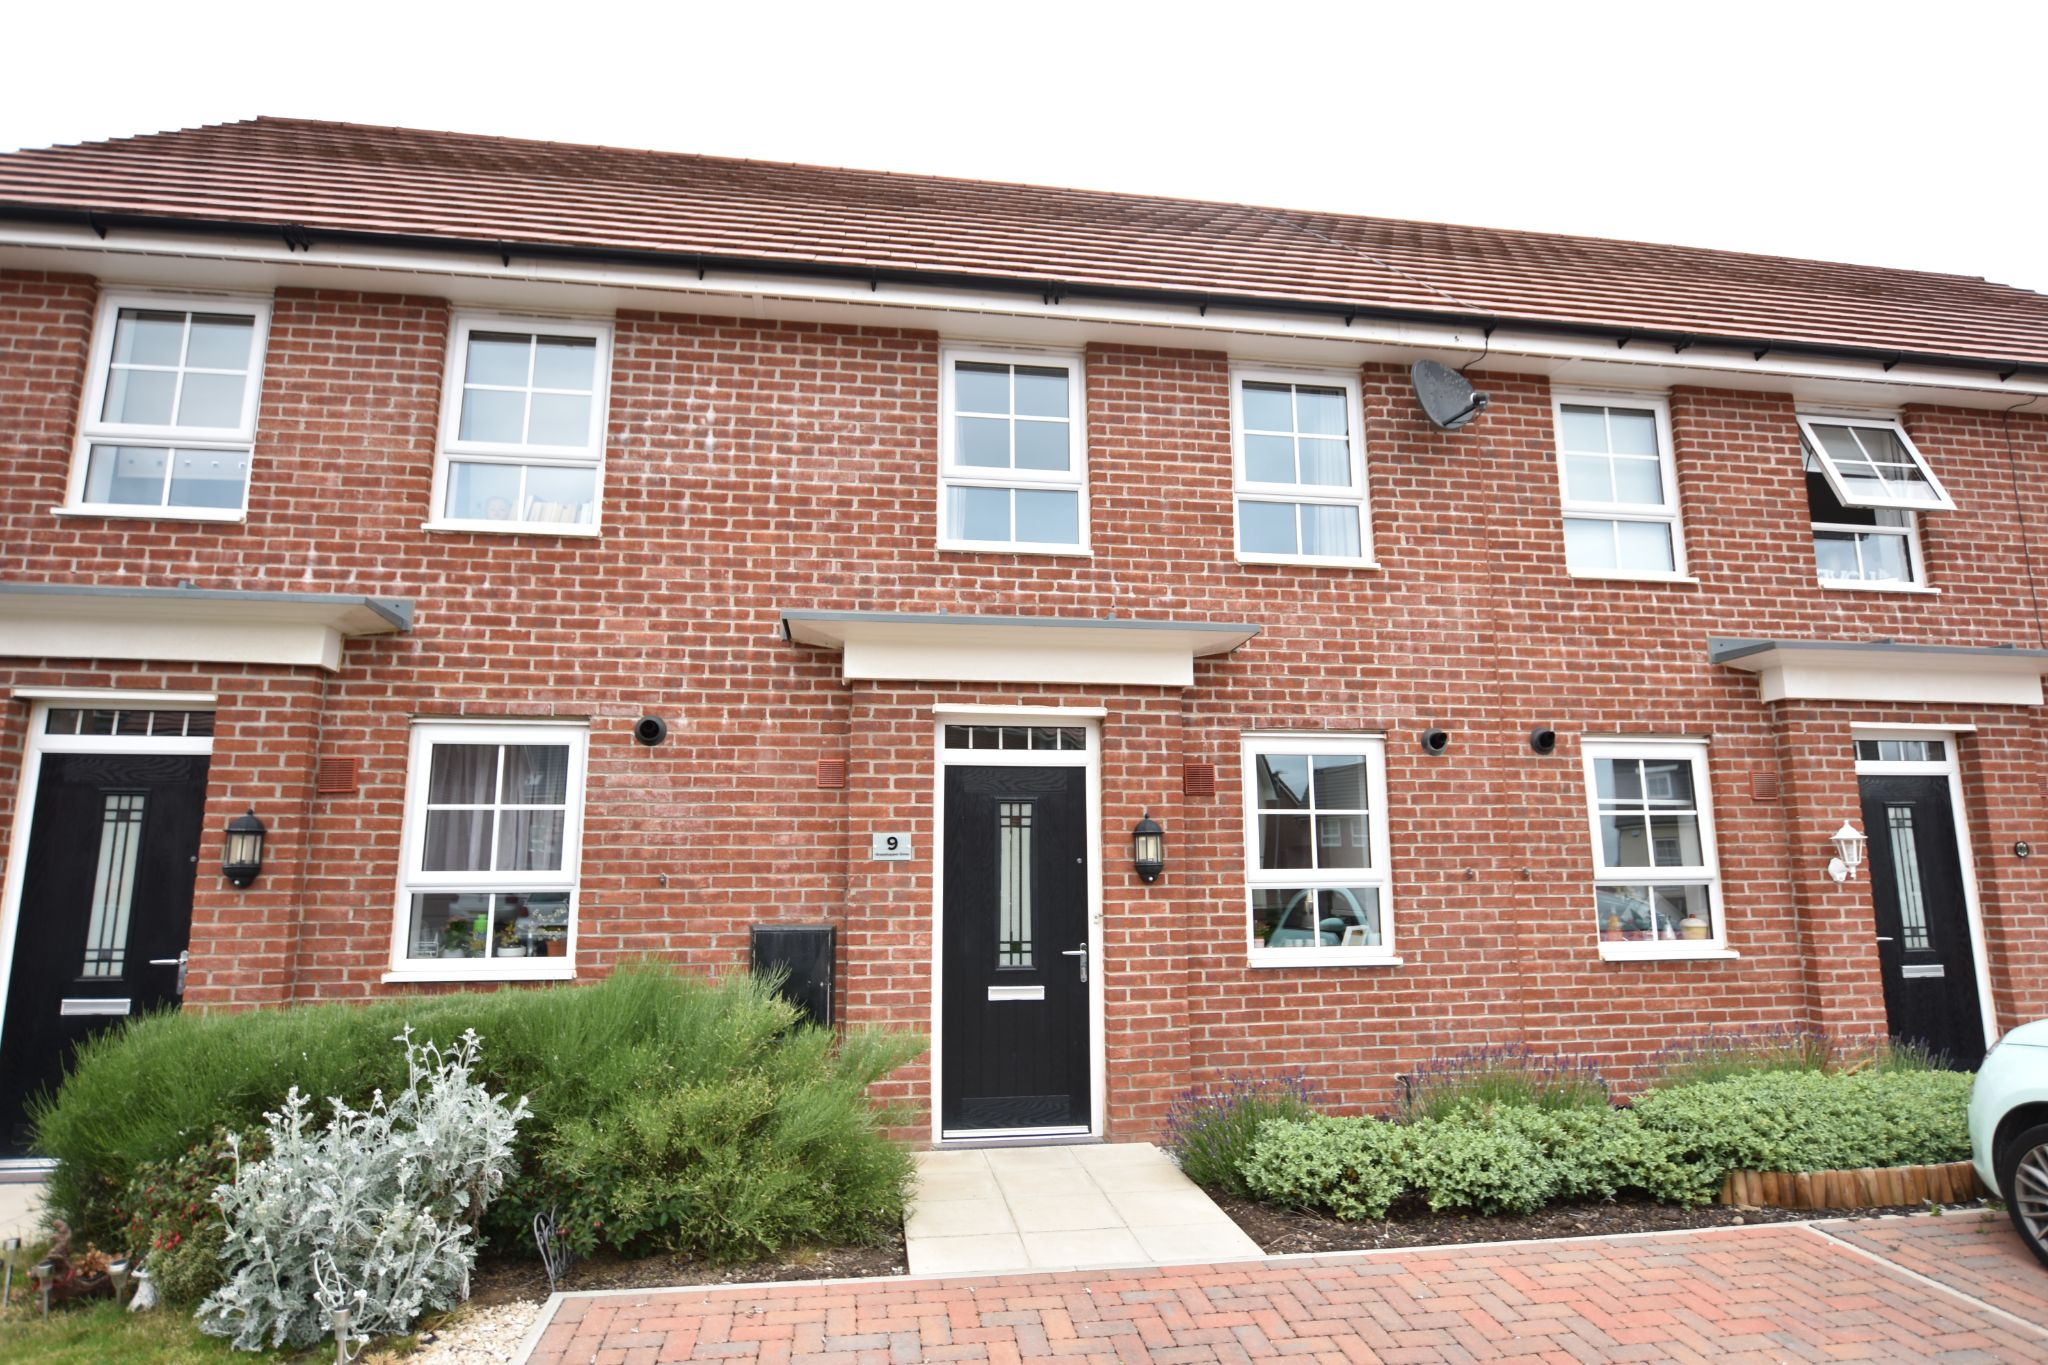 3 bedroom mid terraced house For Sale in Preston - Grasshopper Drive